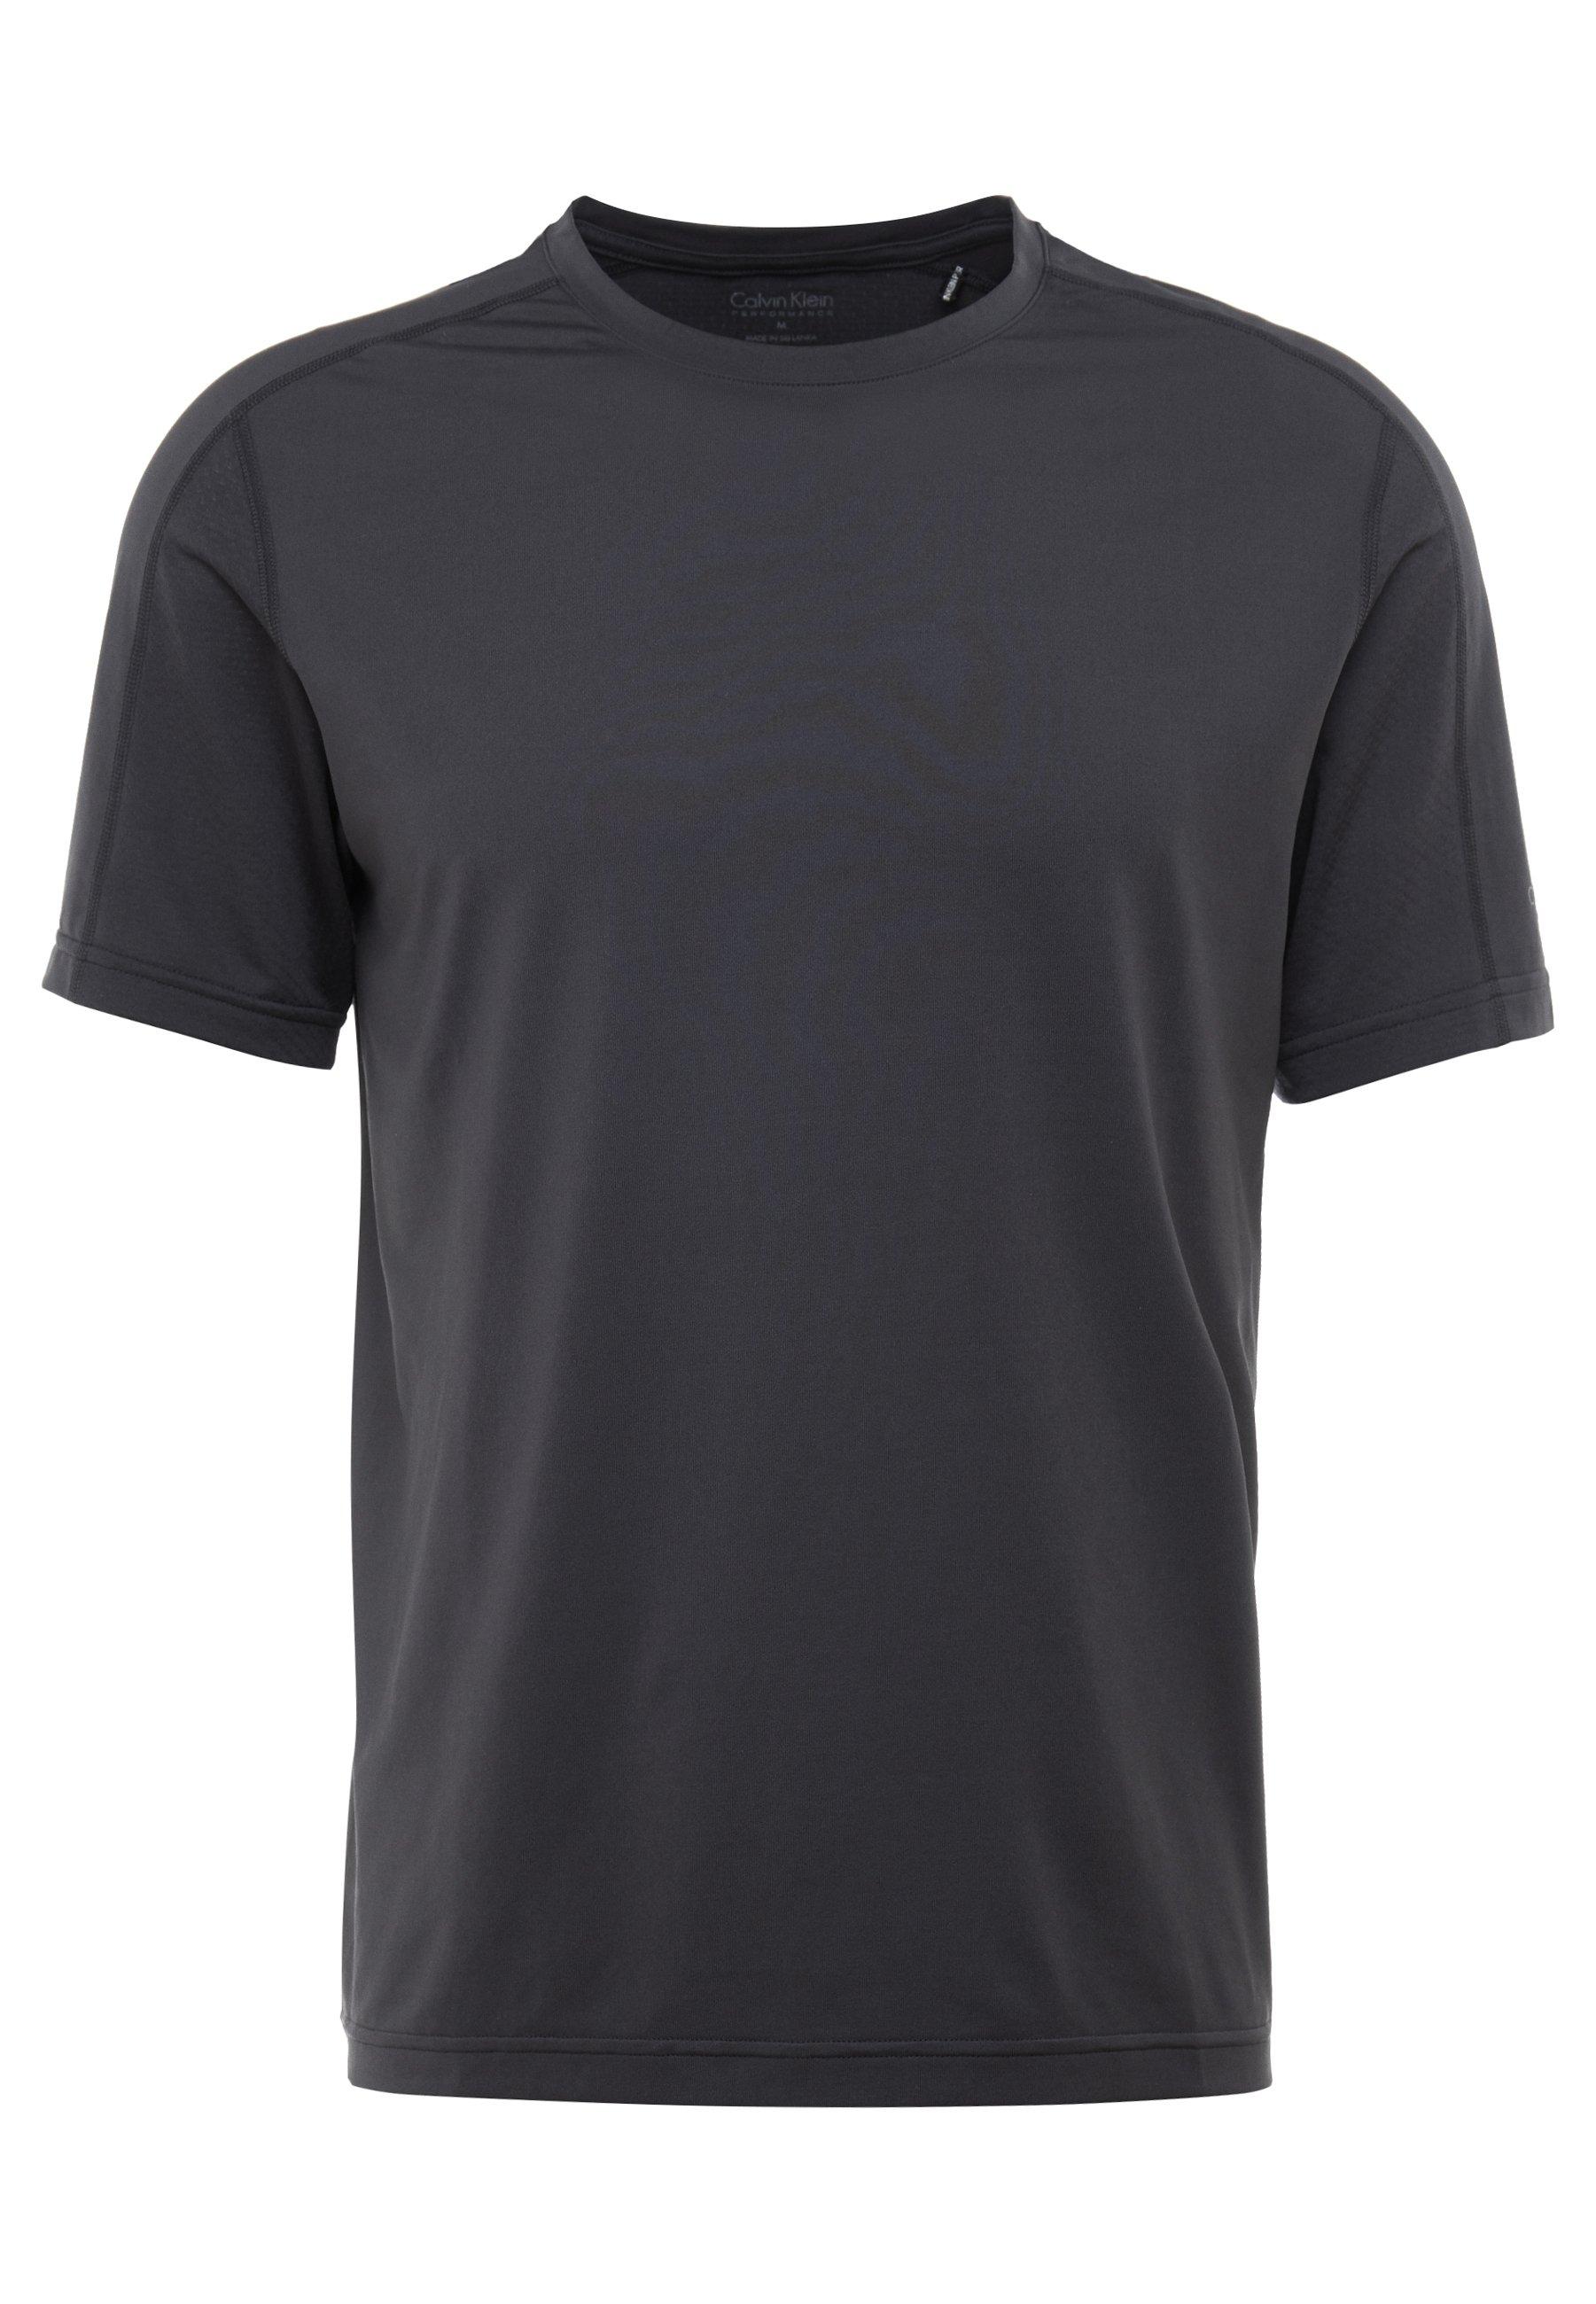 Calvin Klein Performance Tee - T-shirt Con Stampa Grey irunqC3